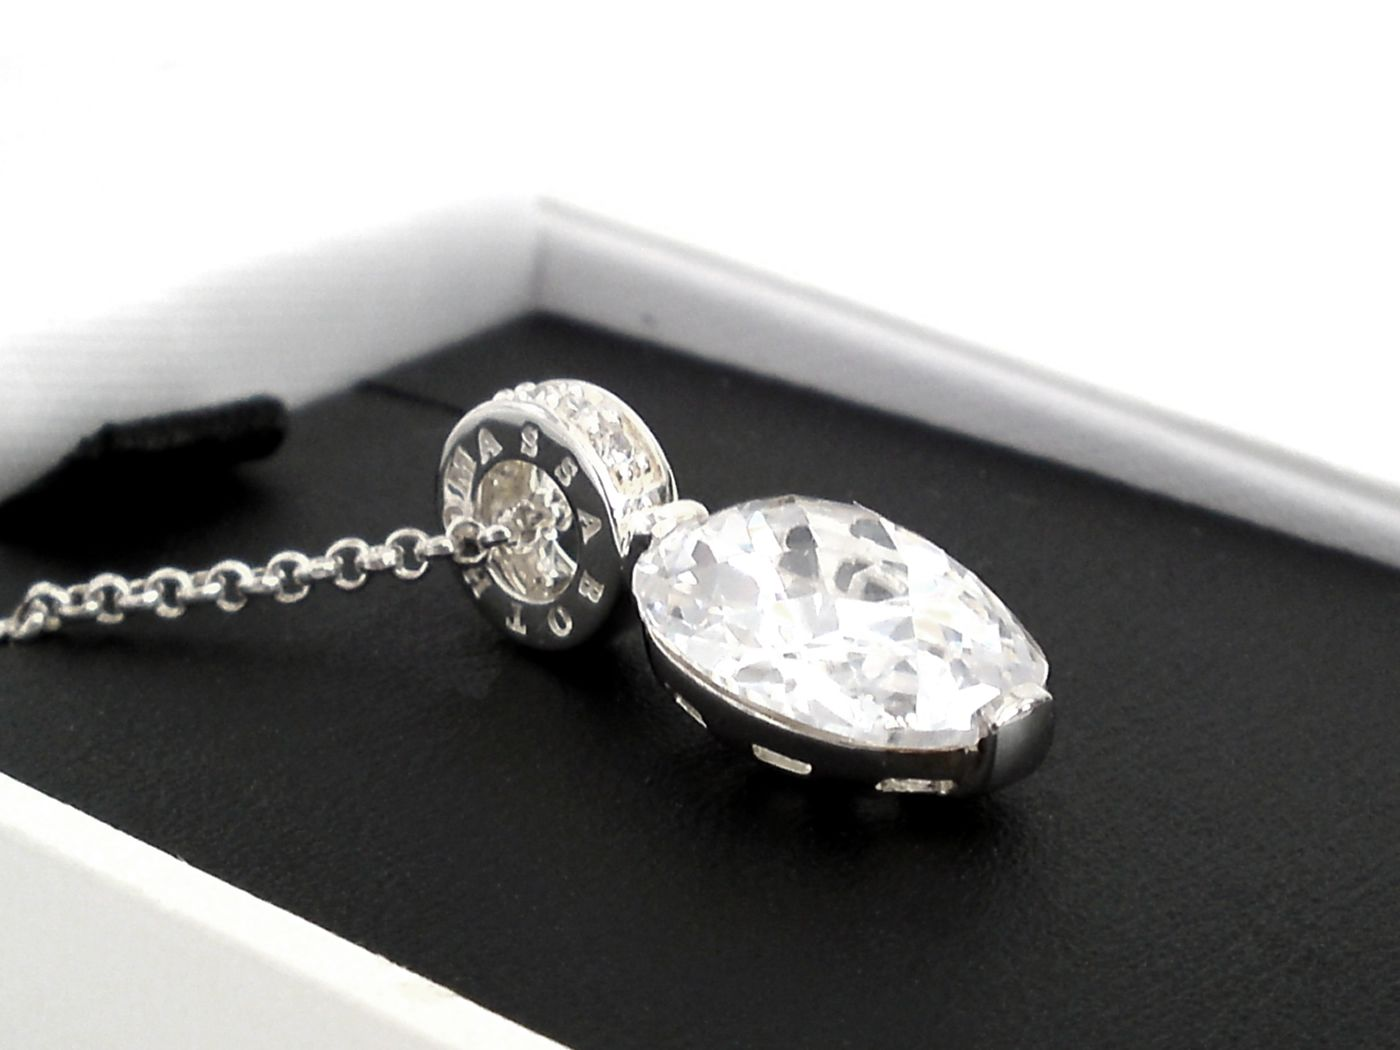 thomas sabo schmuck kette colliers auswahl perle zirkonia herz medallion ebay. Black Bedroom Furniture Sets. Home Design Ideas